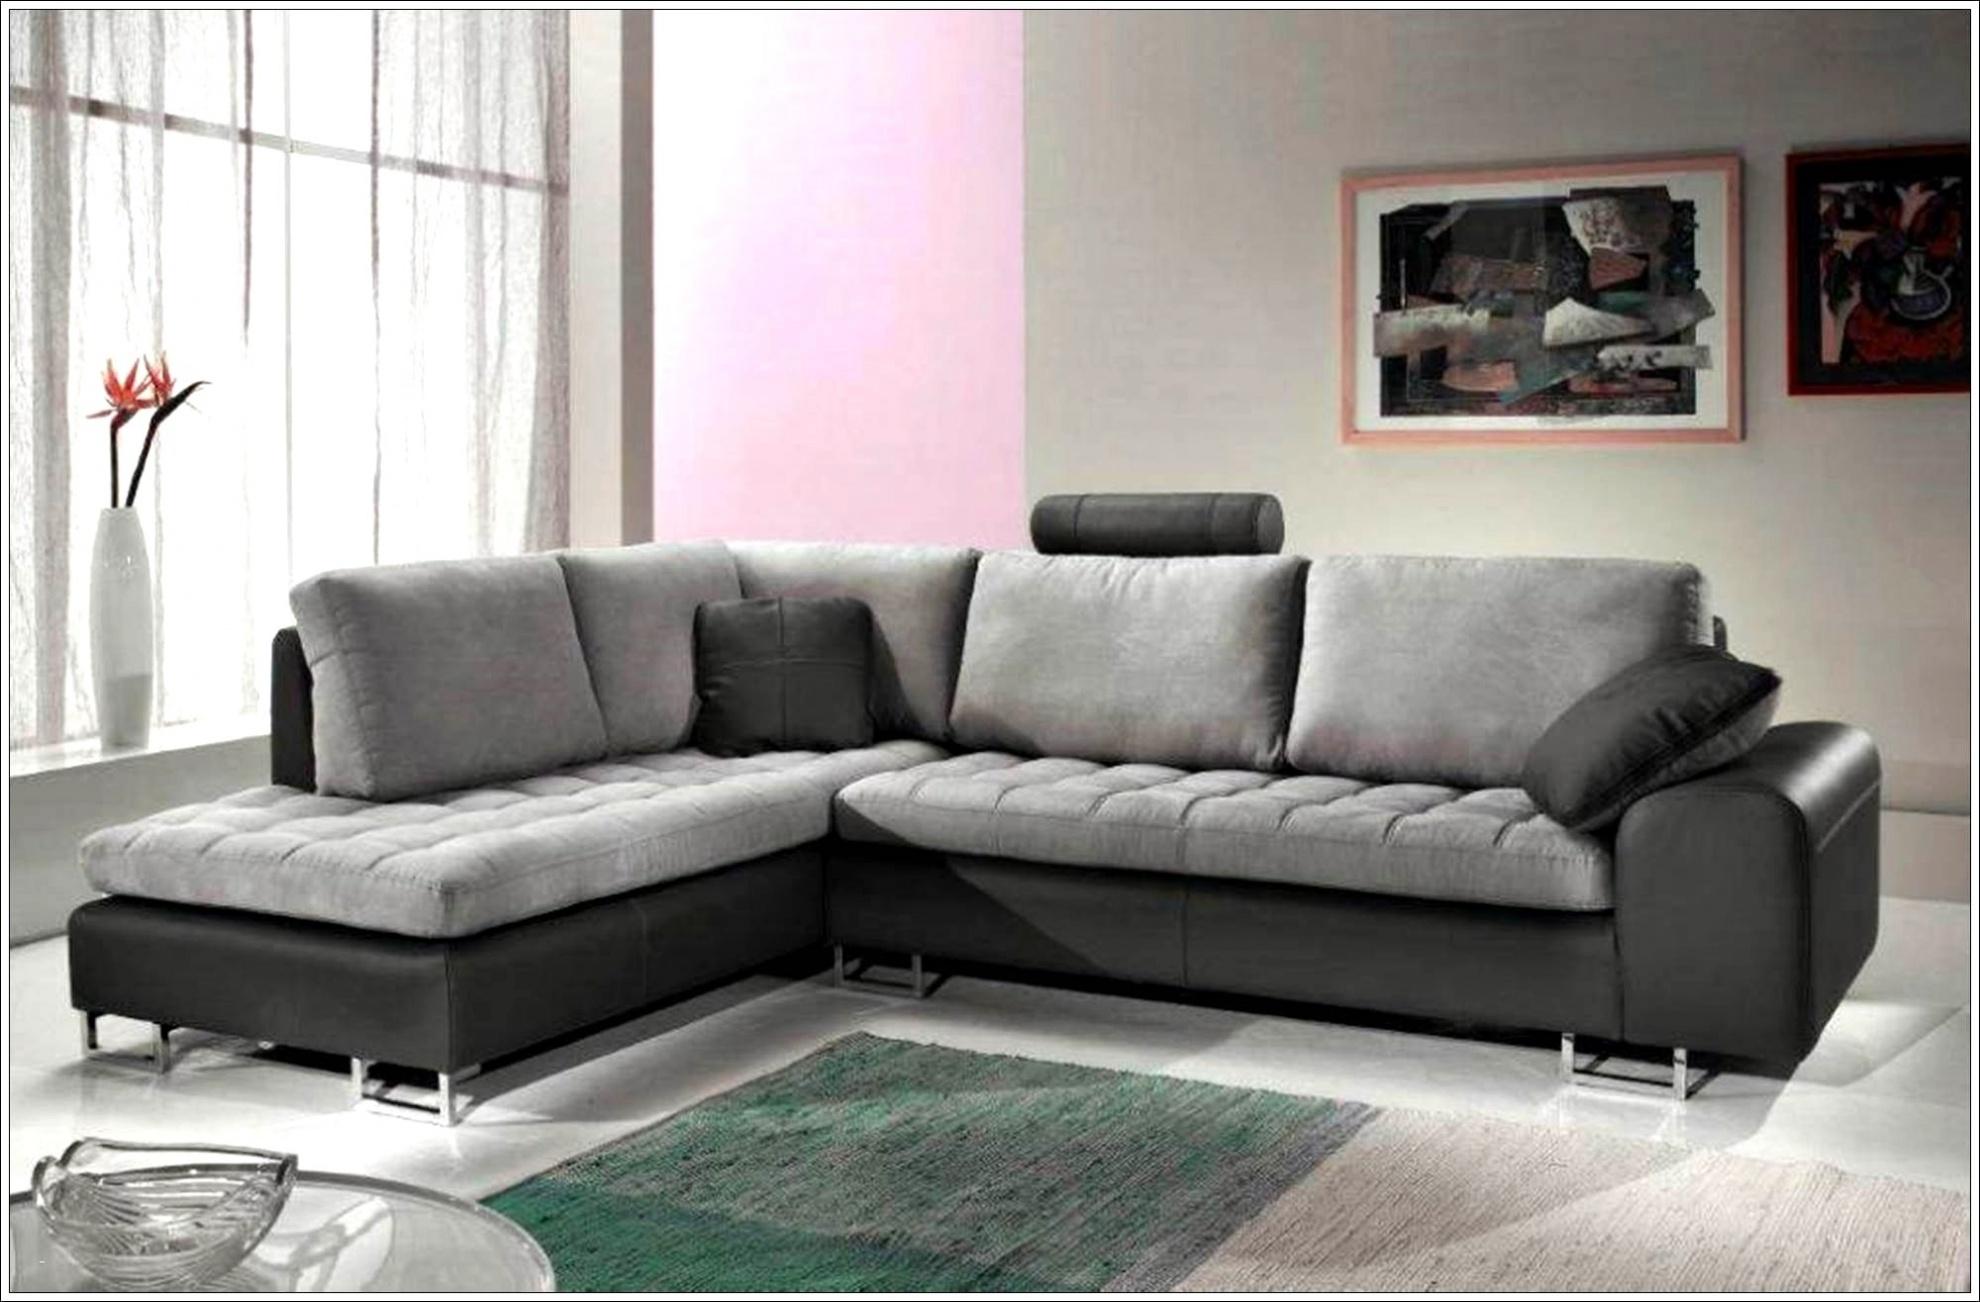 Canapé 4 Places Ikea Unique Photos Maha De Canapé 4 Places Mahagranda De Home